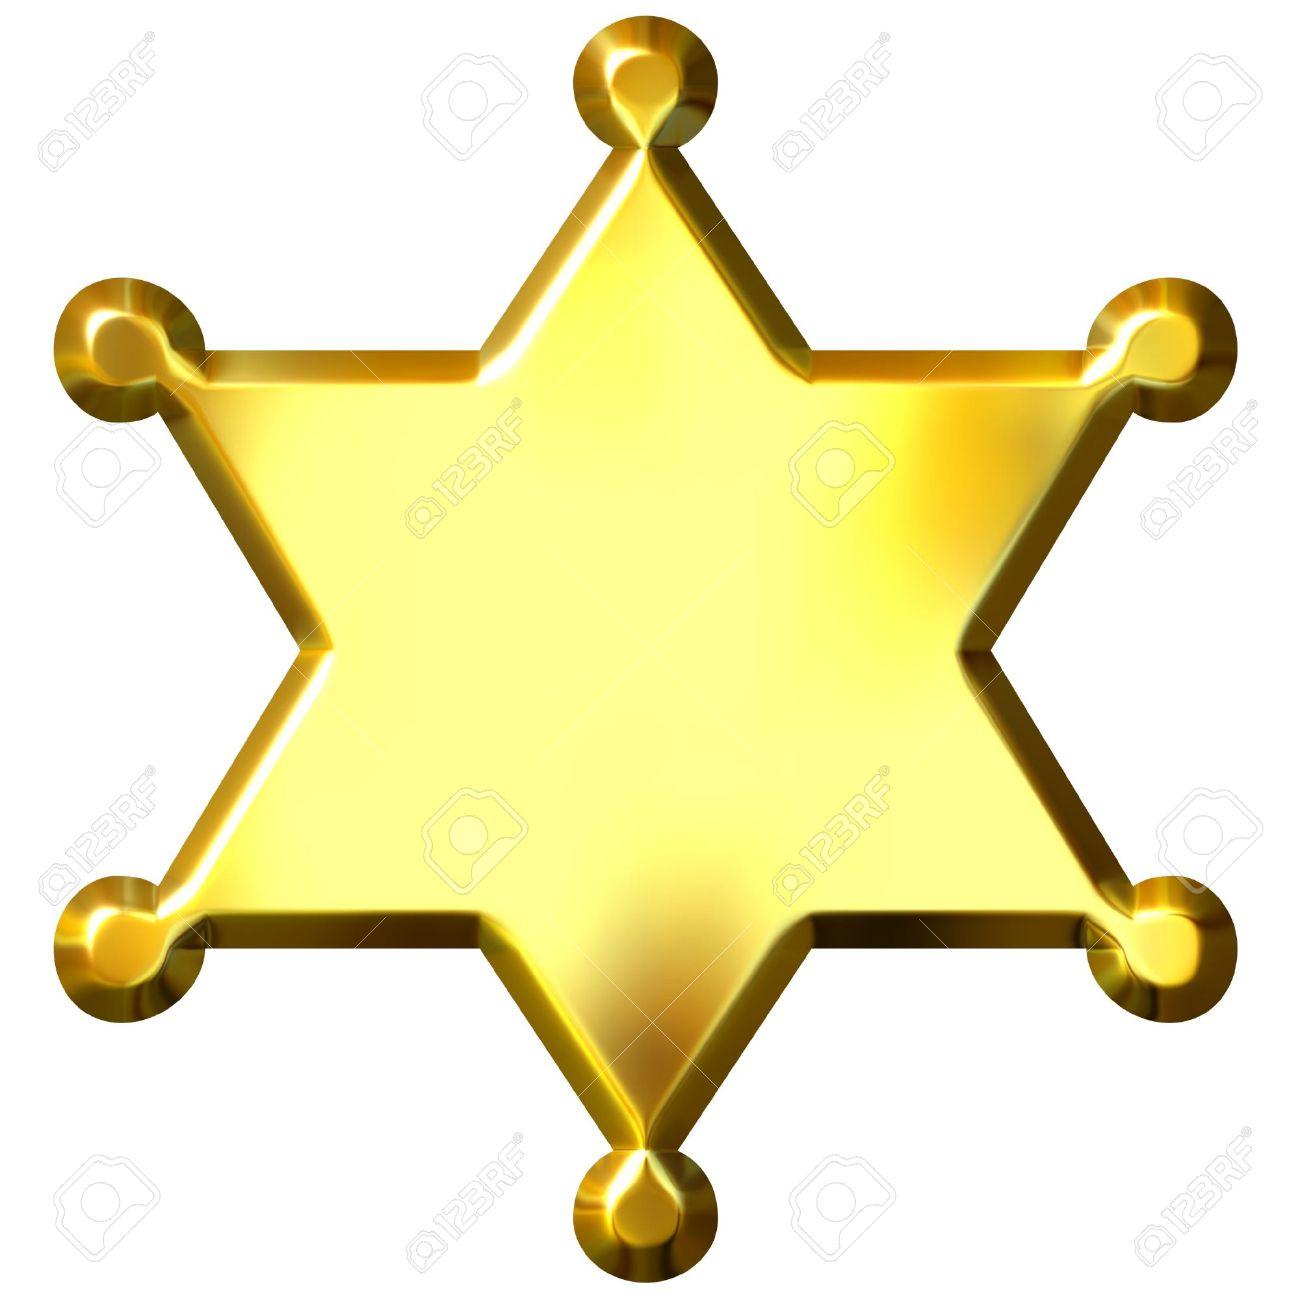 Sheriff badge clipart image free stock Sheriff Badge Clipart | Free download best Sheriff Badge ... image free stock